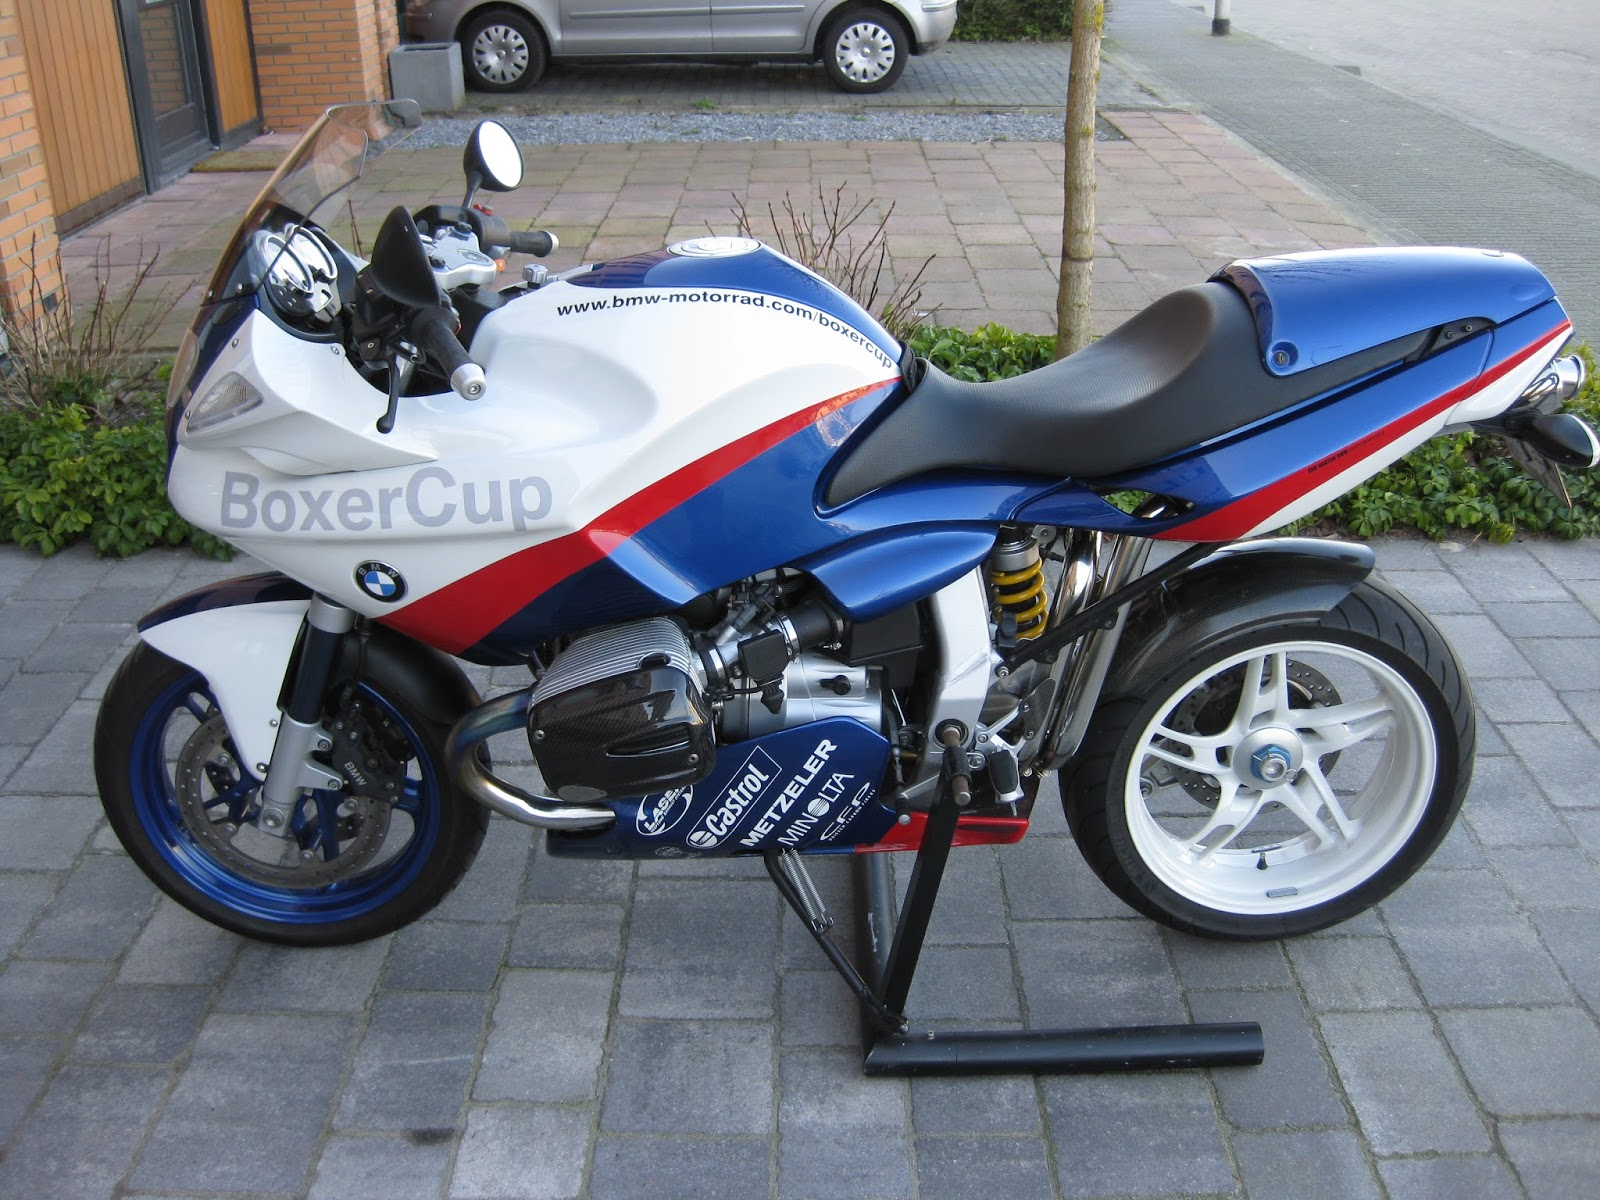 dd motorcycles bmw r1100s boxercup tuning rh daviddreesen blogspot com BMW  R1100t BMW R100